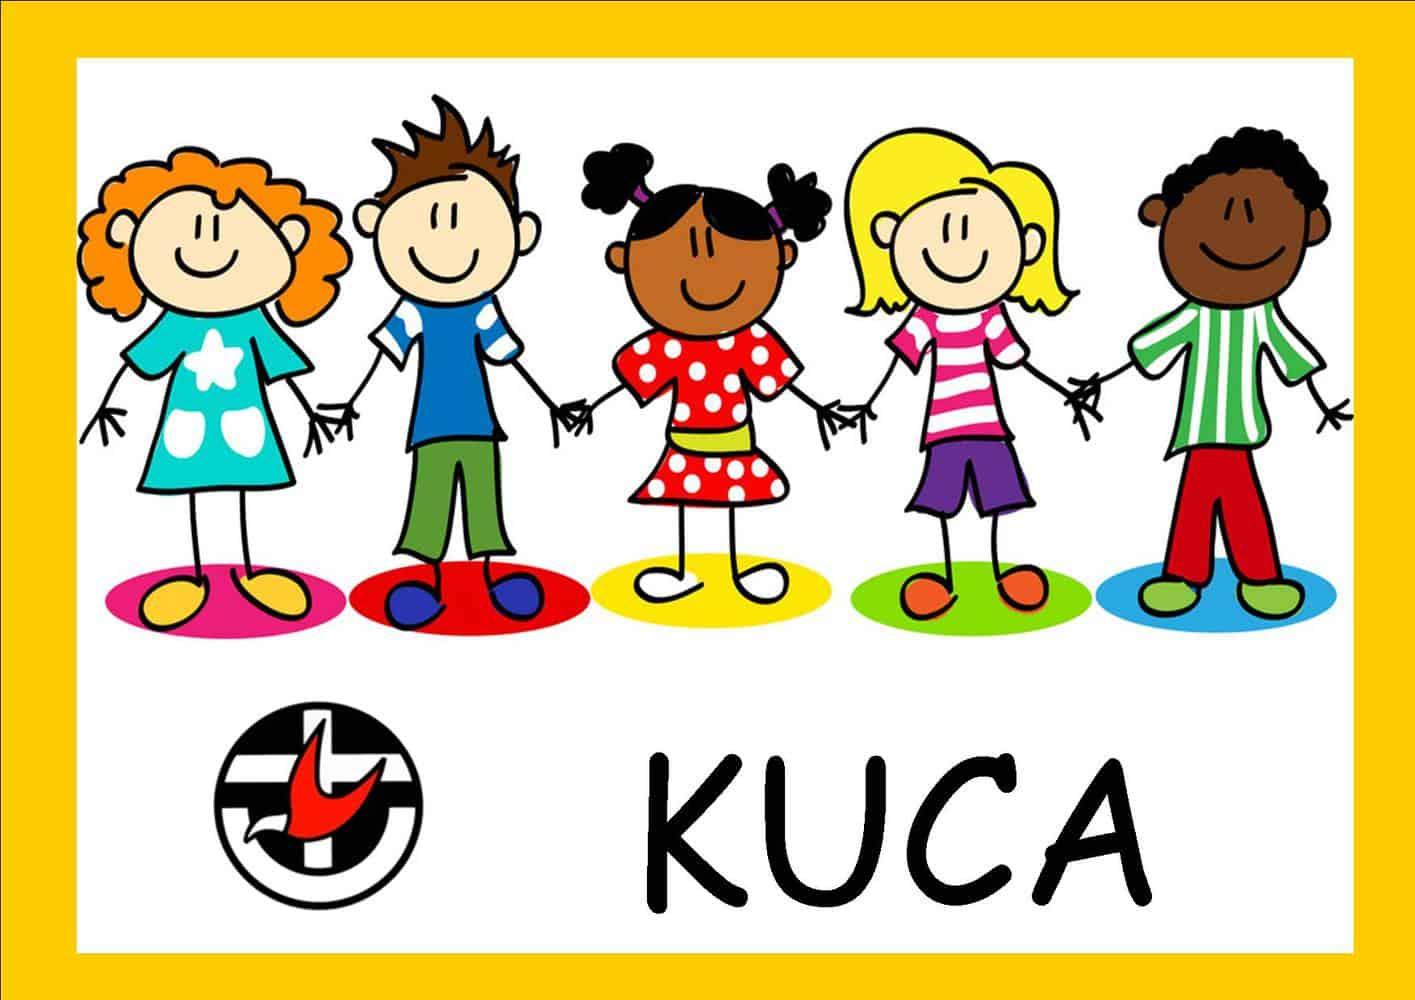 kuca-kids-9